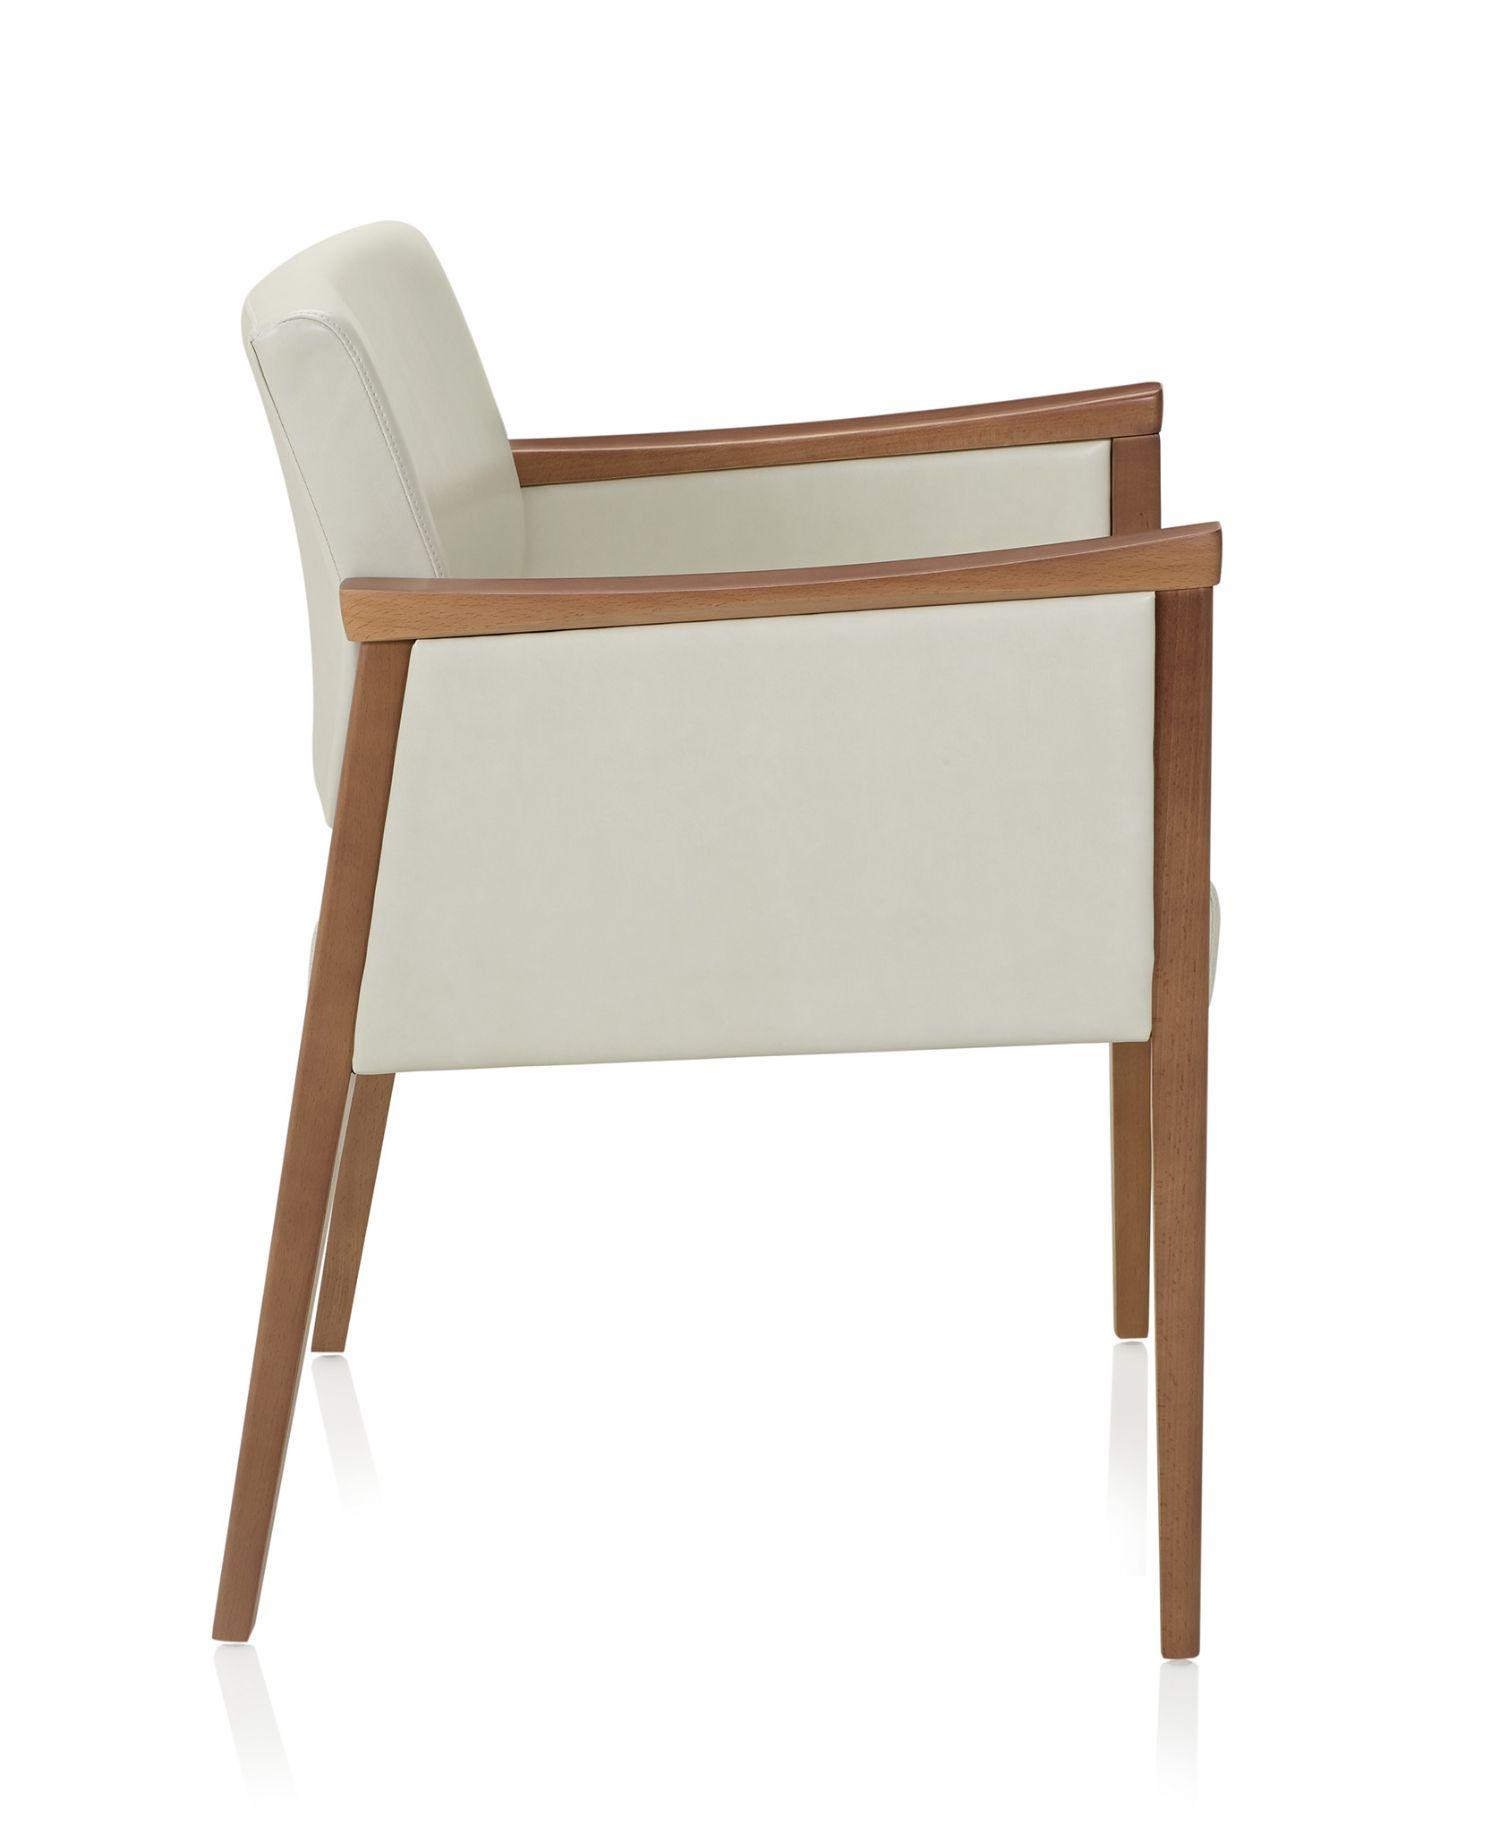 ki affina closed arm guest chair - side